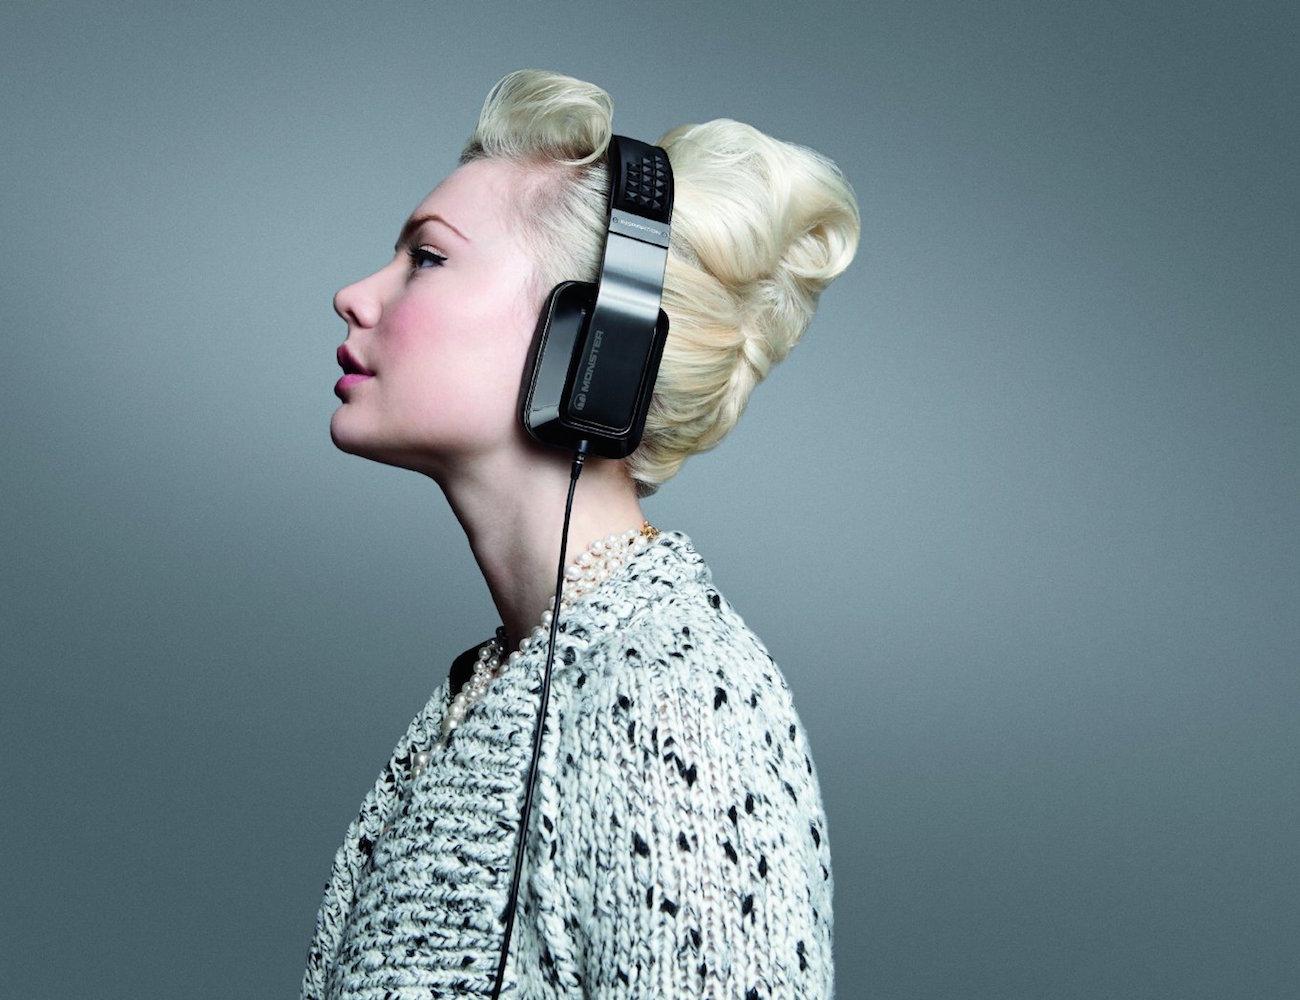 monster-inspiration-active-noise-canceling-over-ear-headphones-02